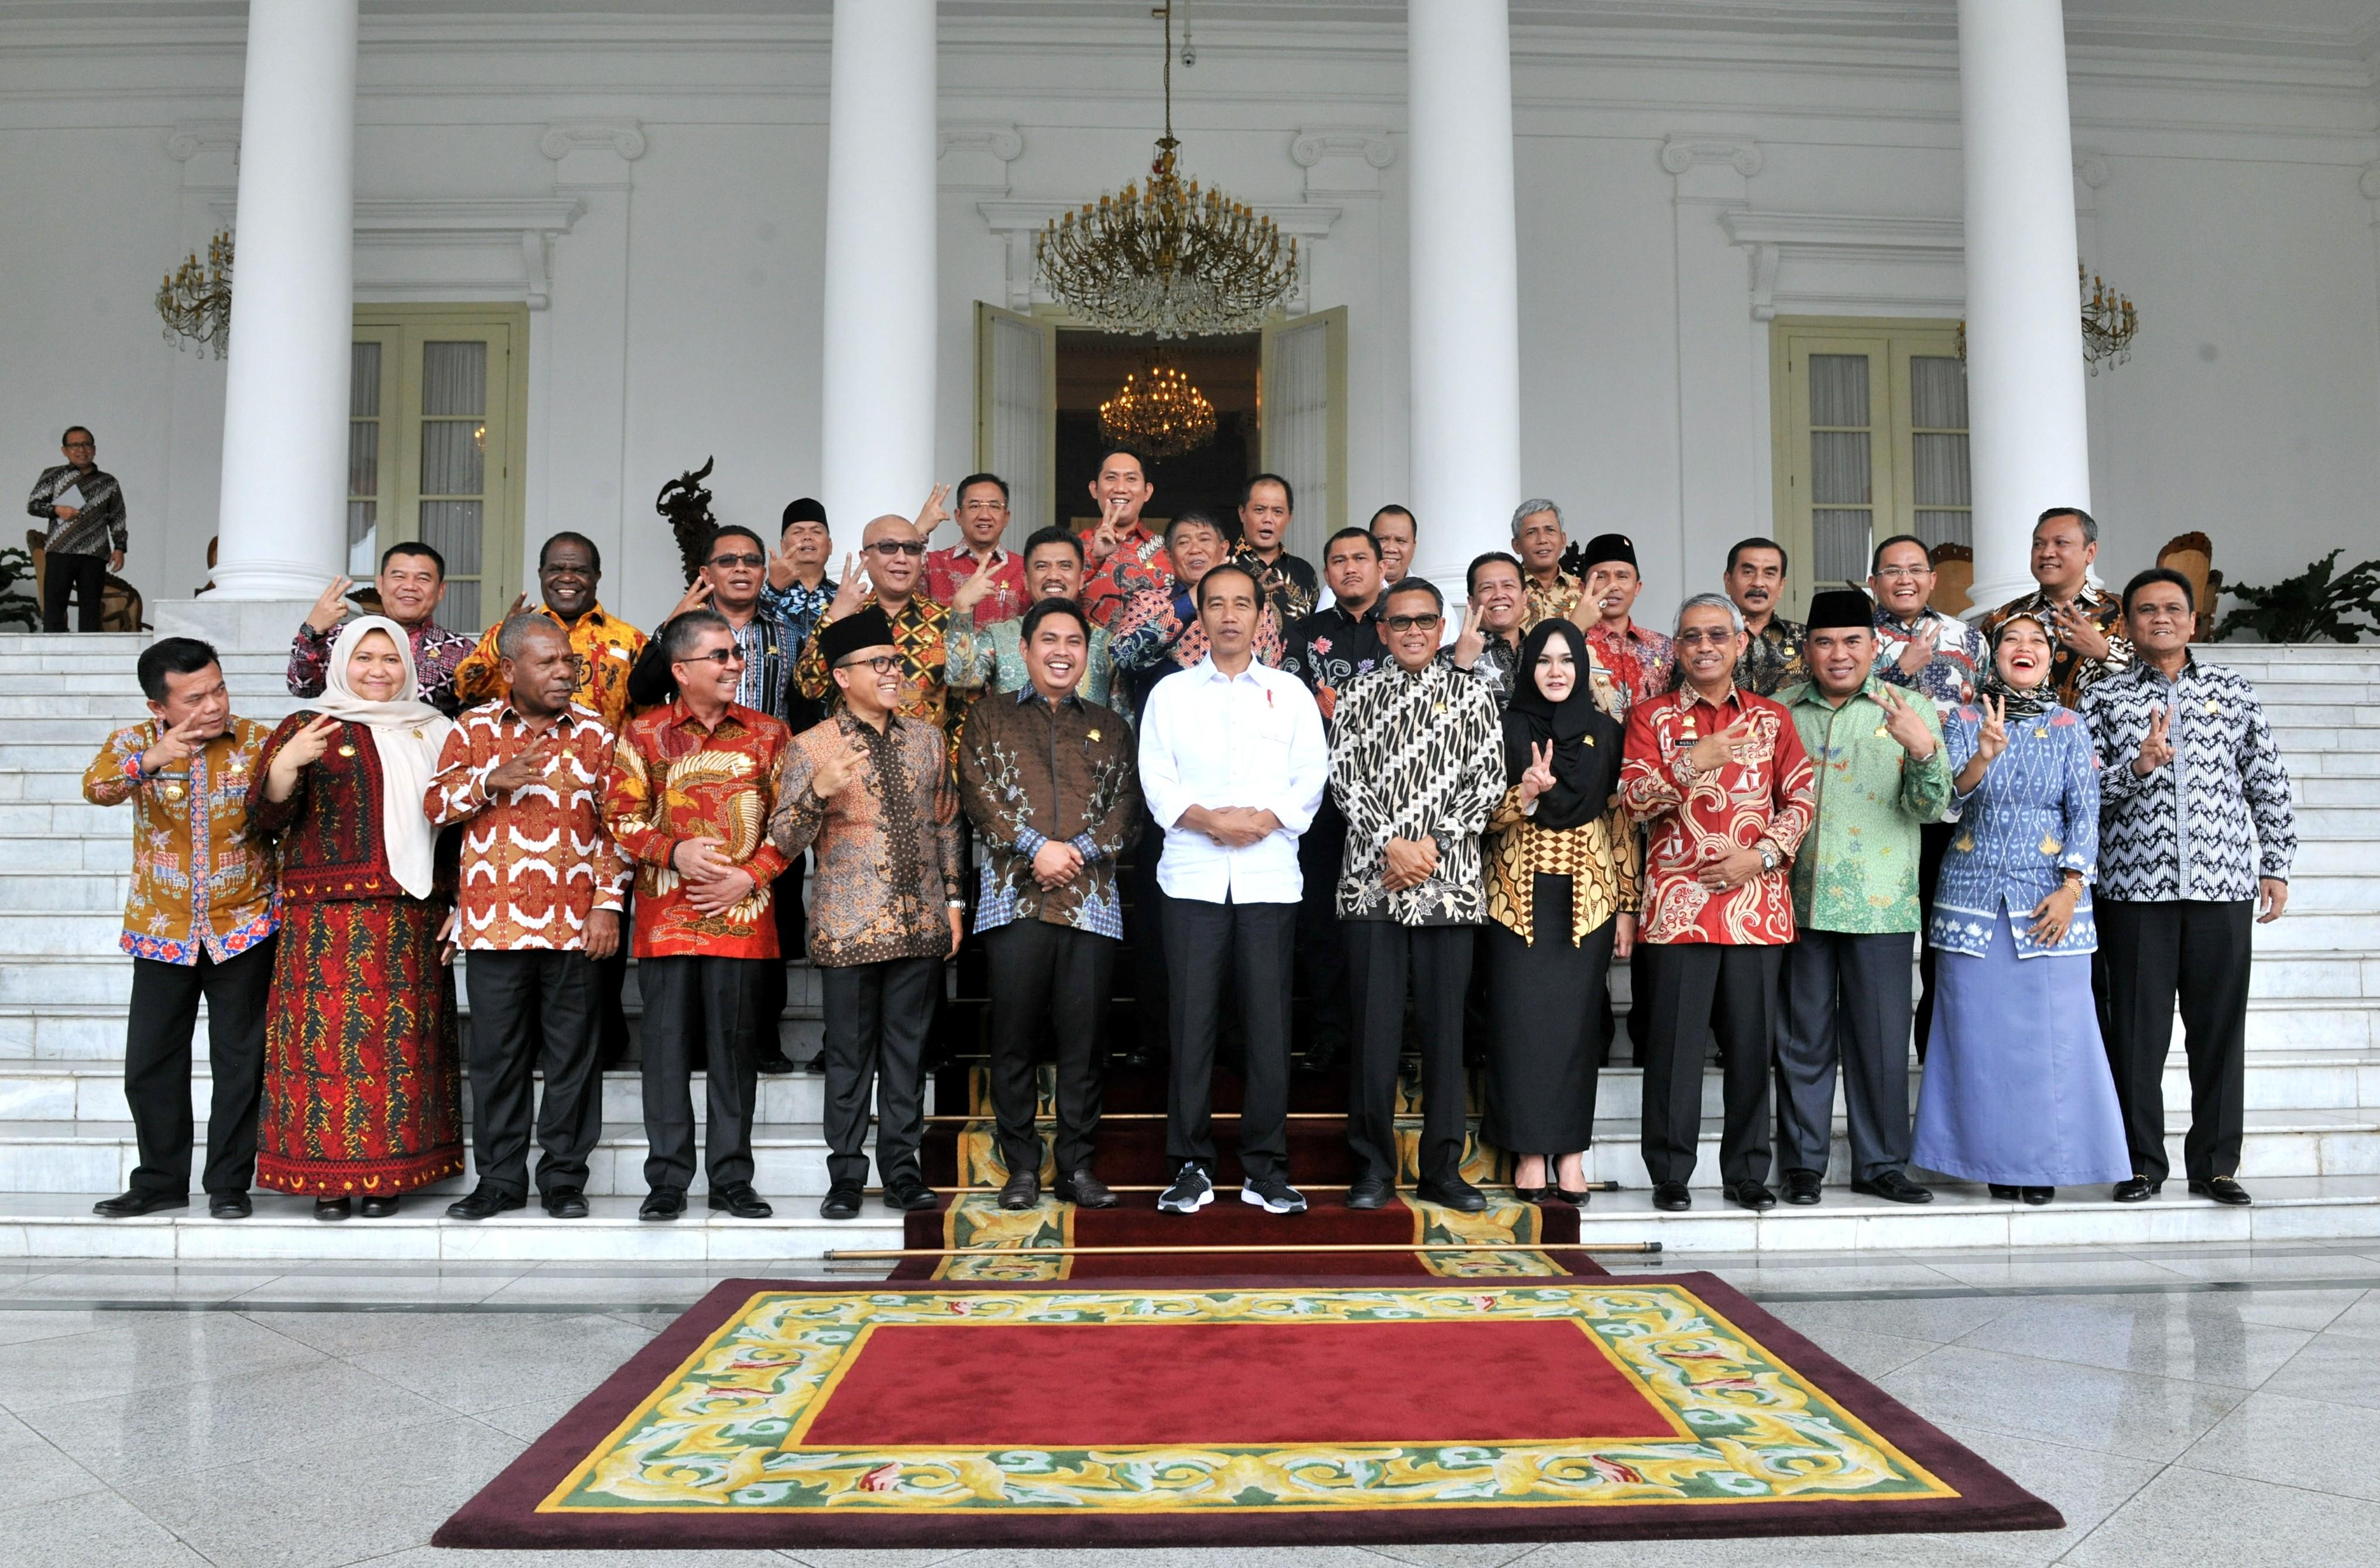 Presiden Jokowi berfoto bersama para bupati yang mengikuti pertemuan di Istana Kepresidenan Bogor, Jabar, Selasa (31/7/2018) siang. (Foto: Rahmat/Humas)